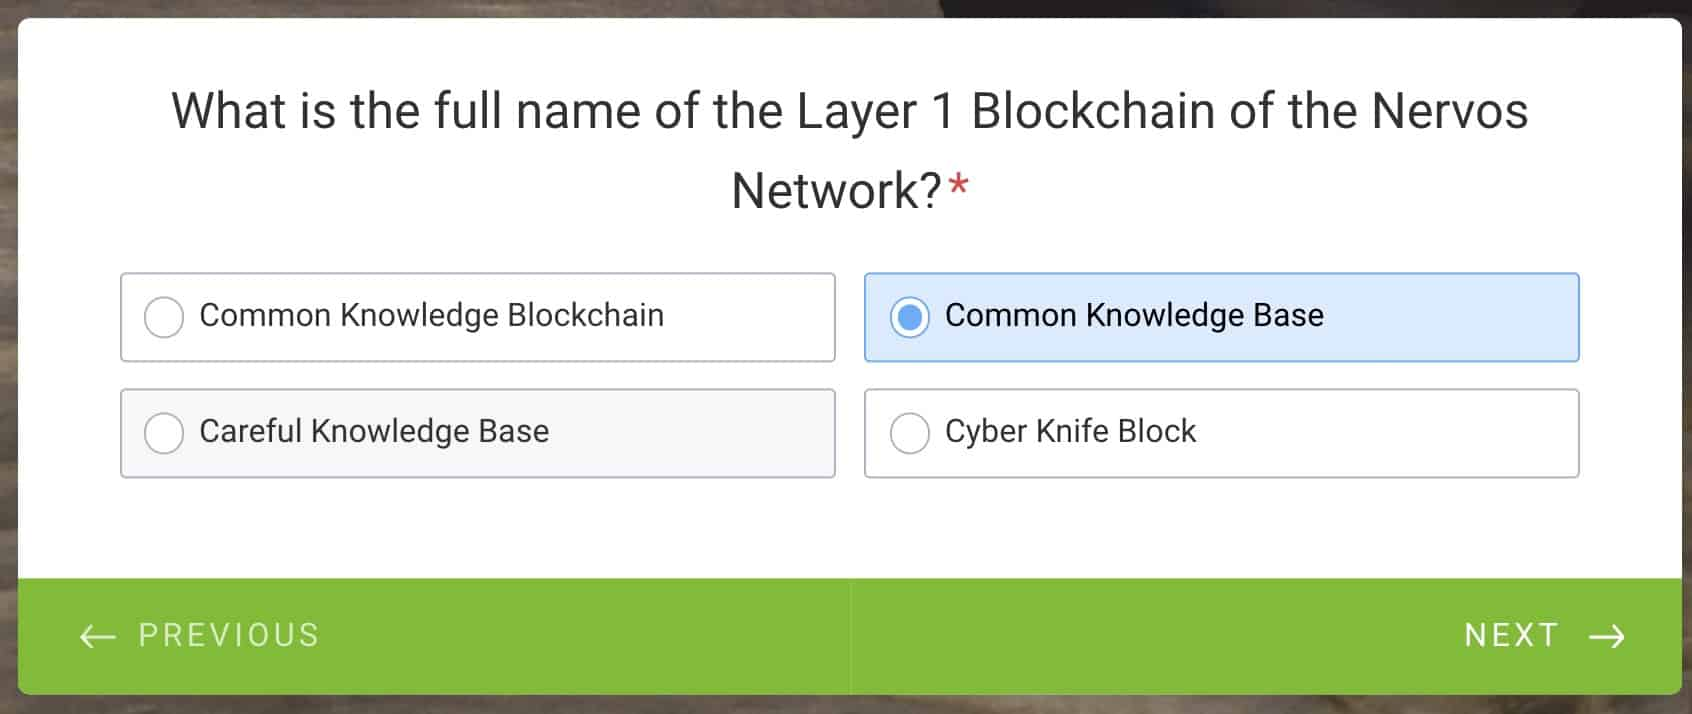 common knowledge base